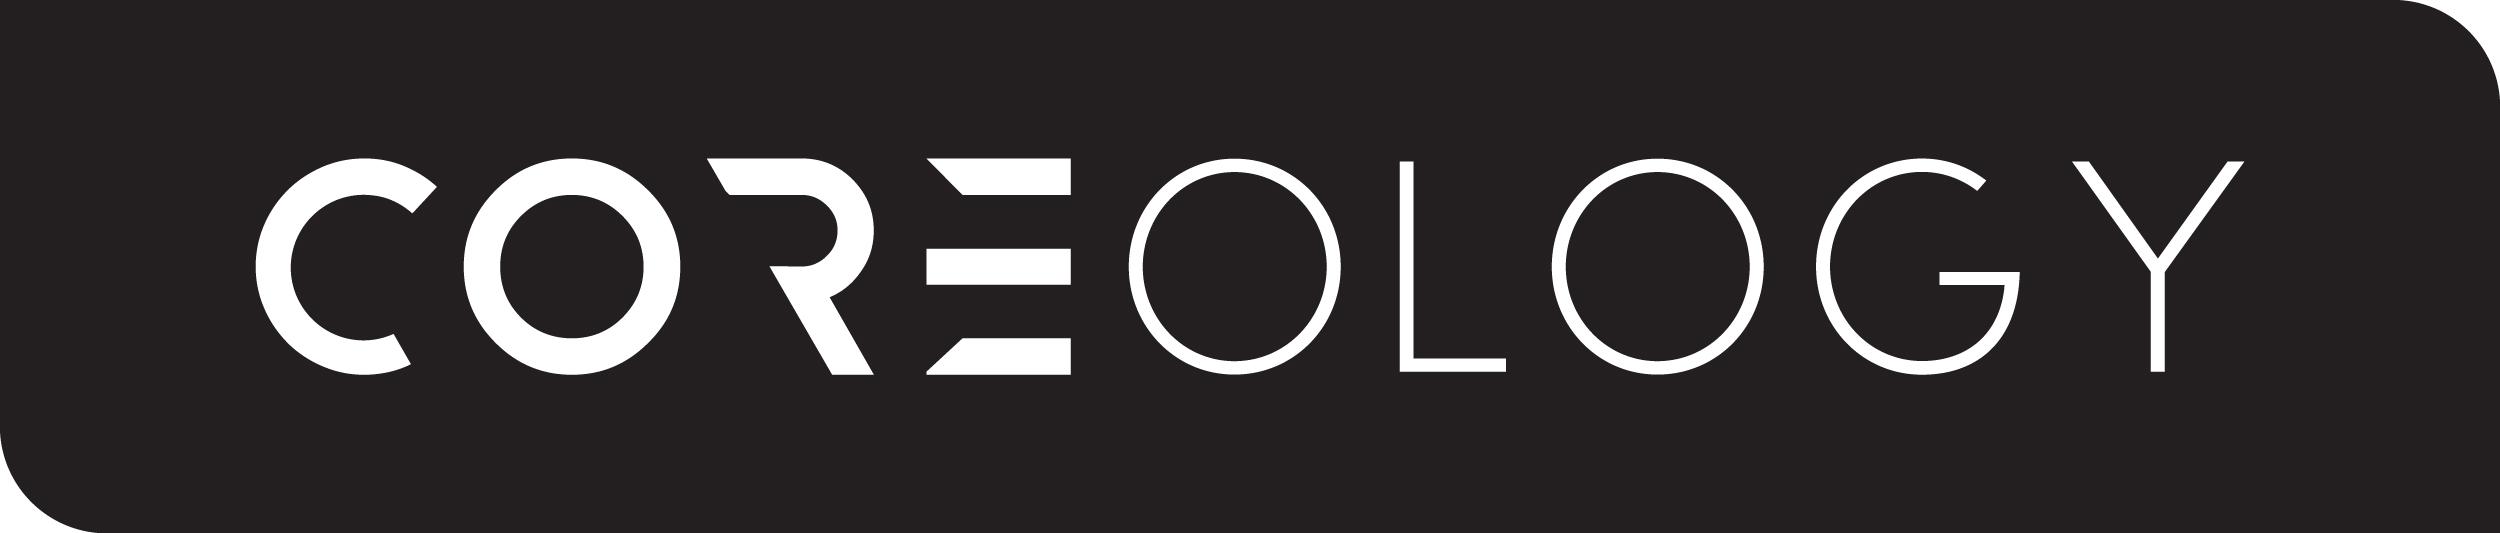 Horizontal, negative variation of the new logo.